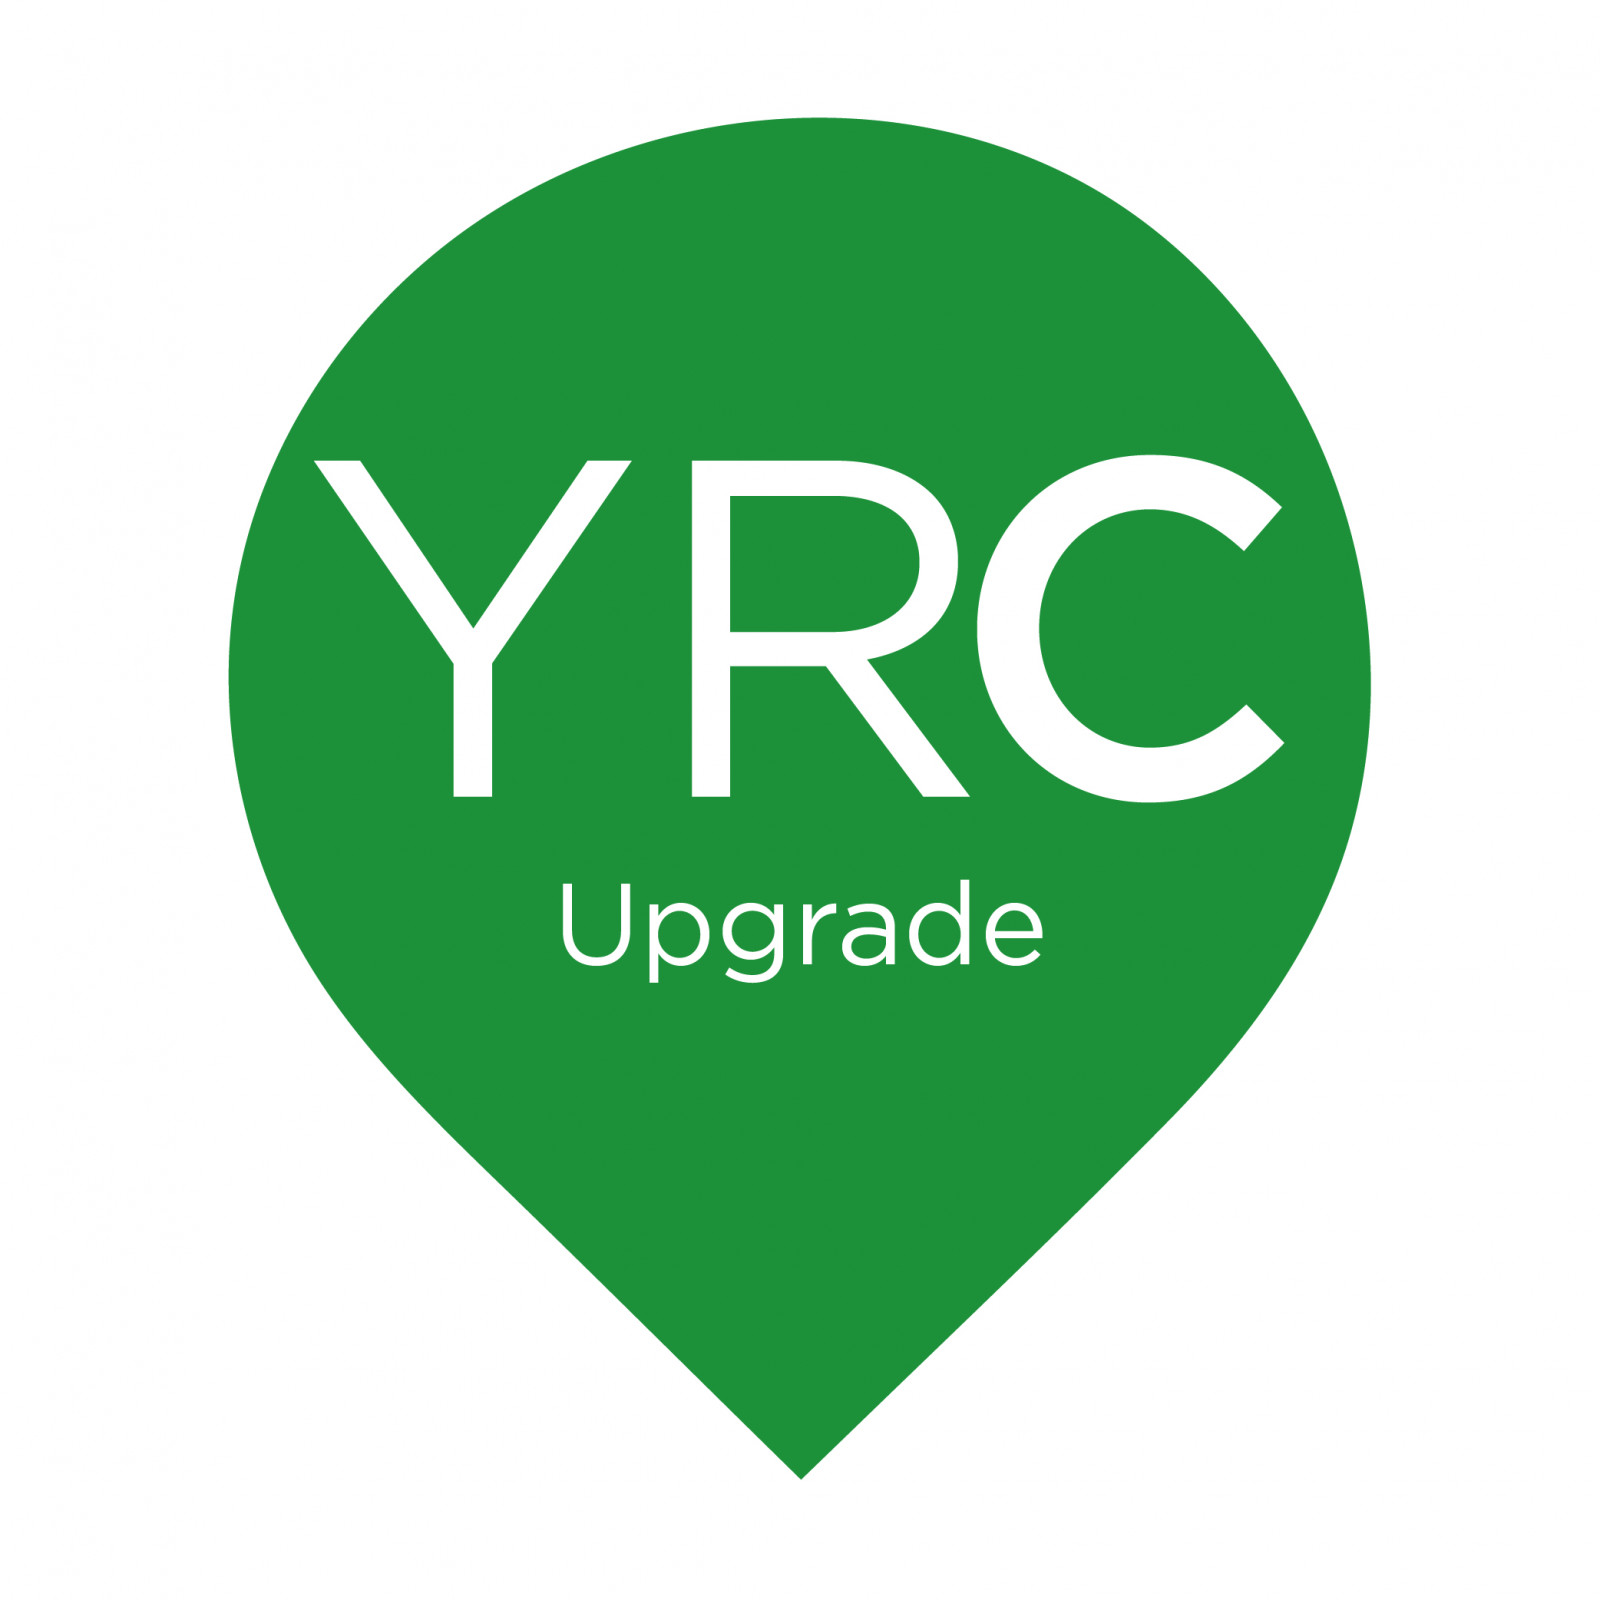 YRC UPGRADE_2019